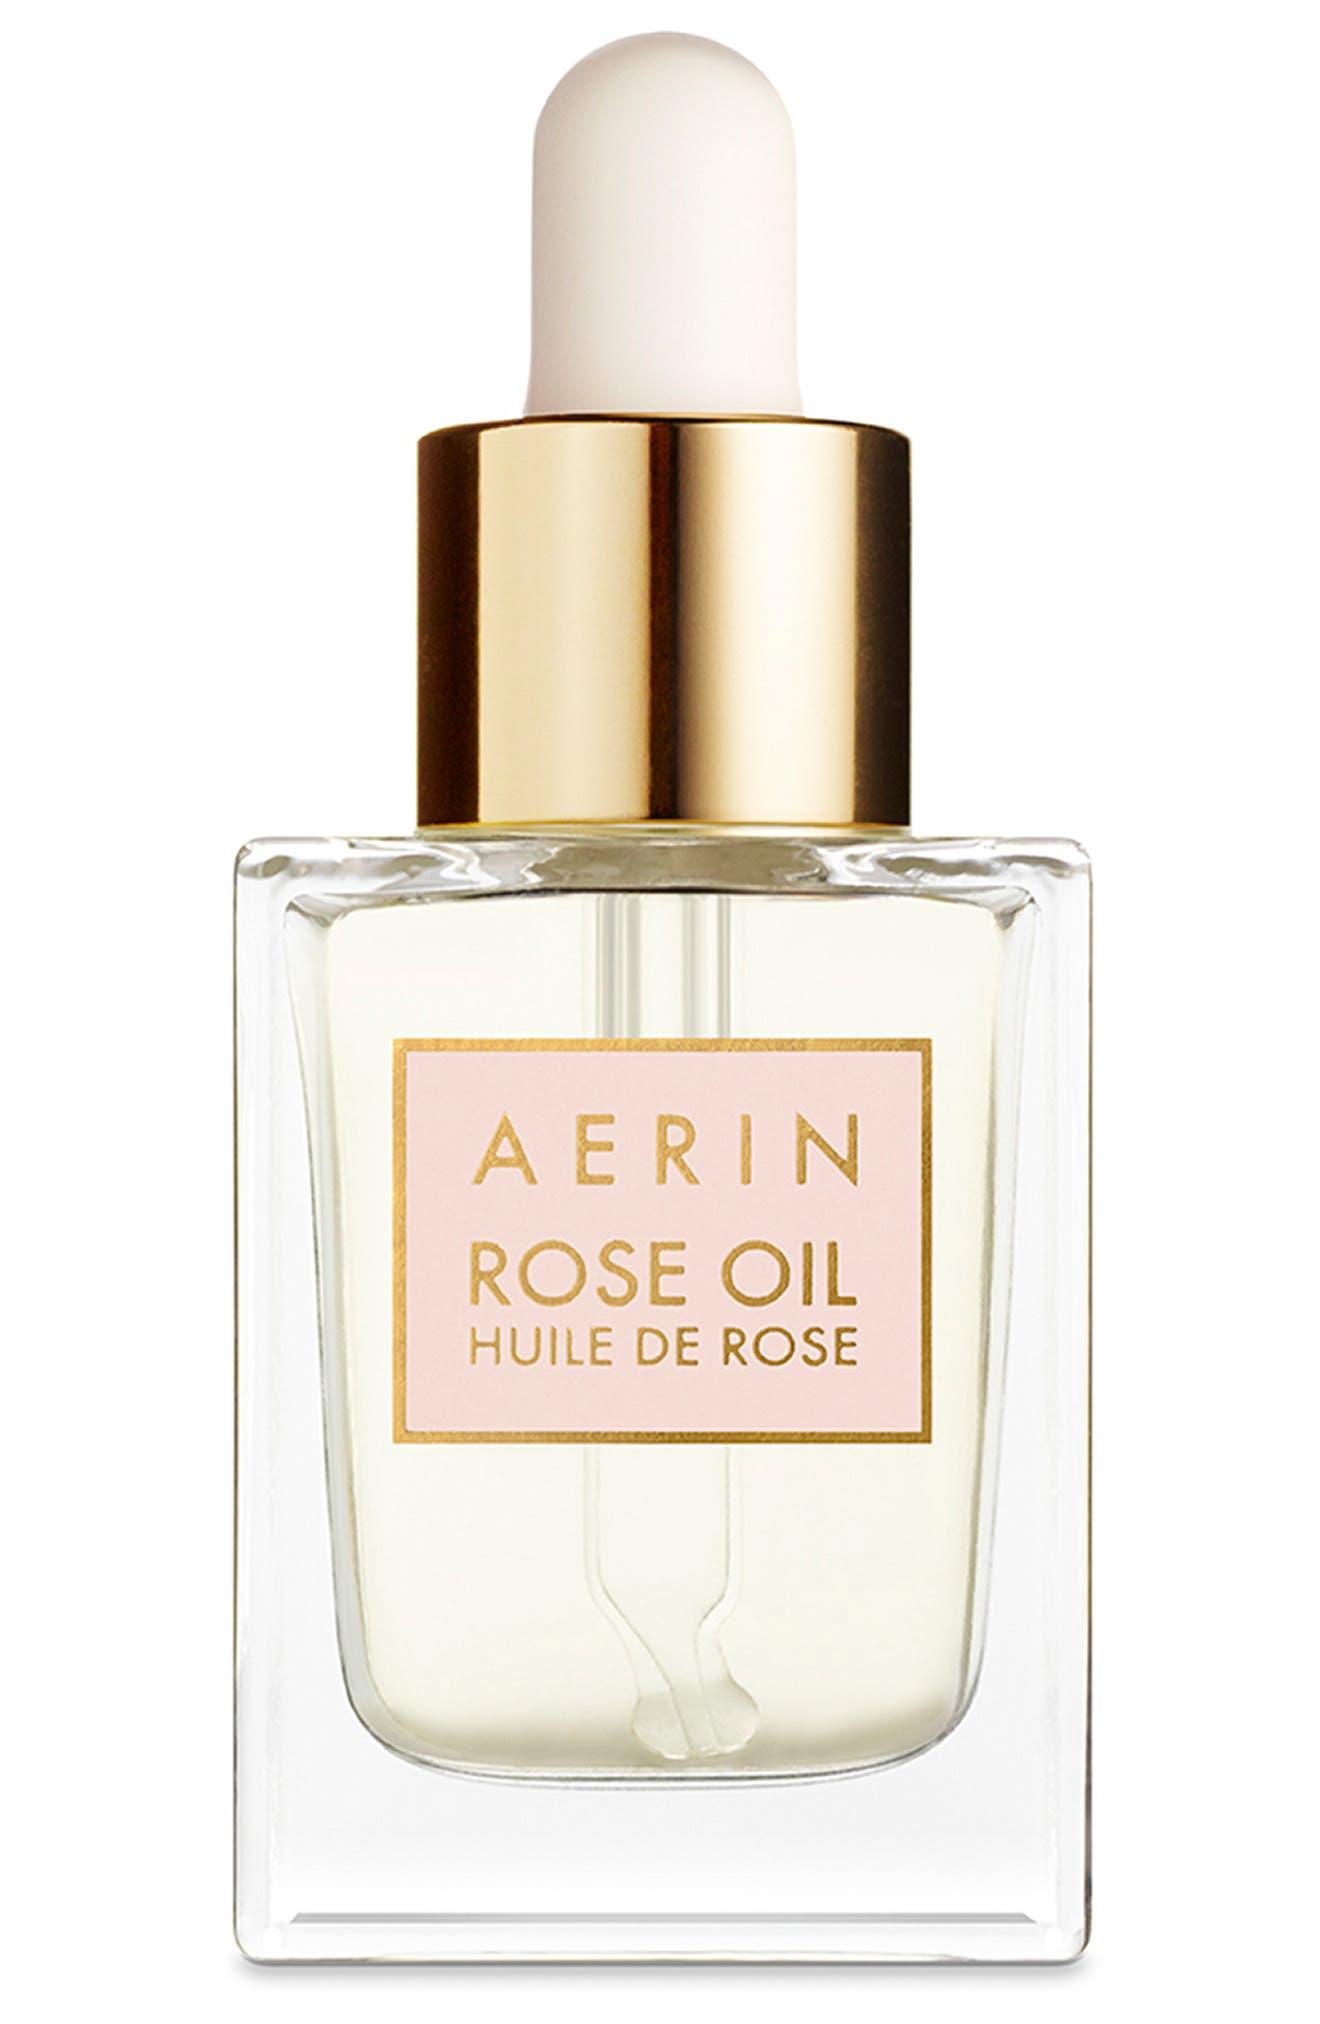 Aerin Beauty Rose Oil